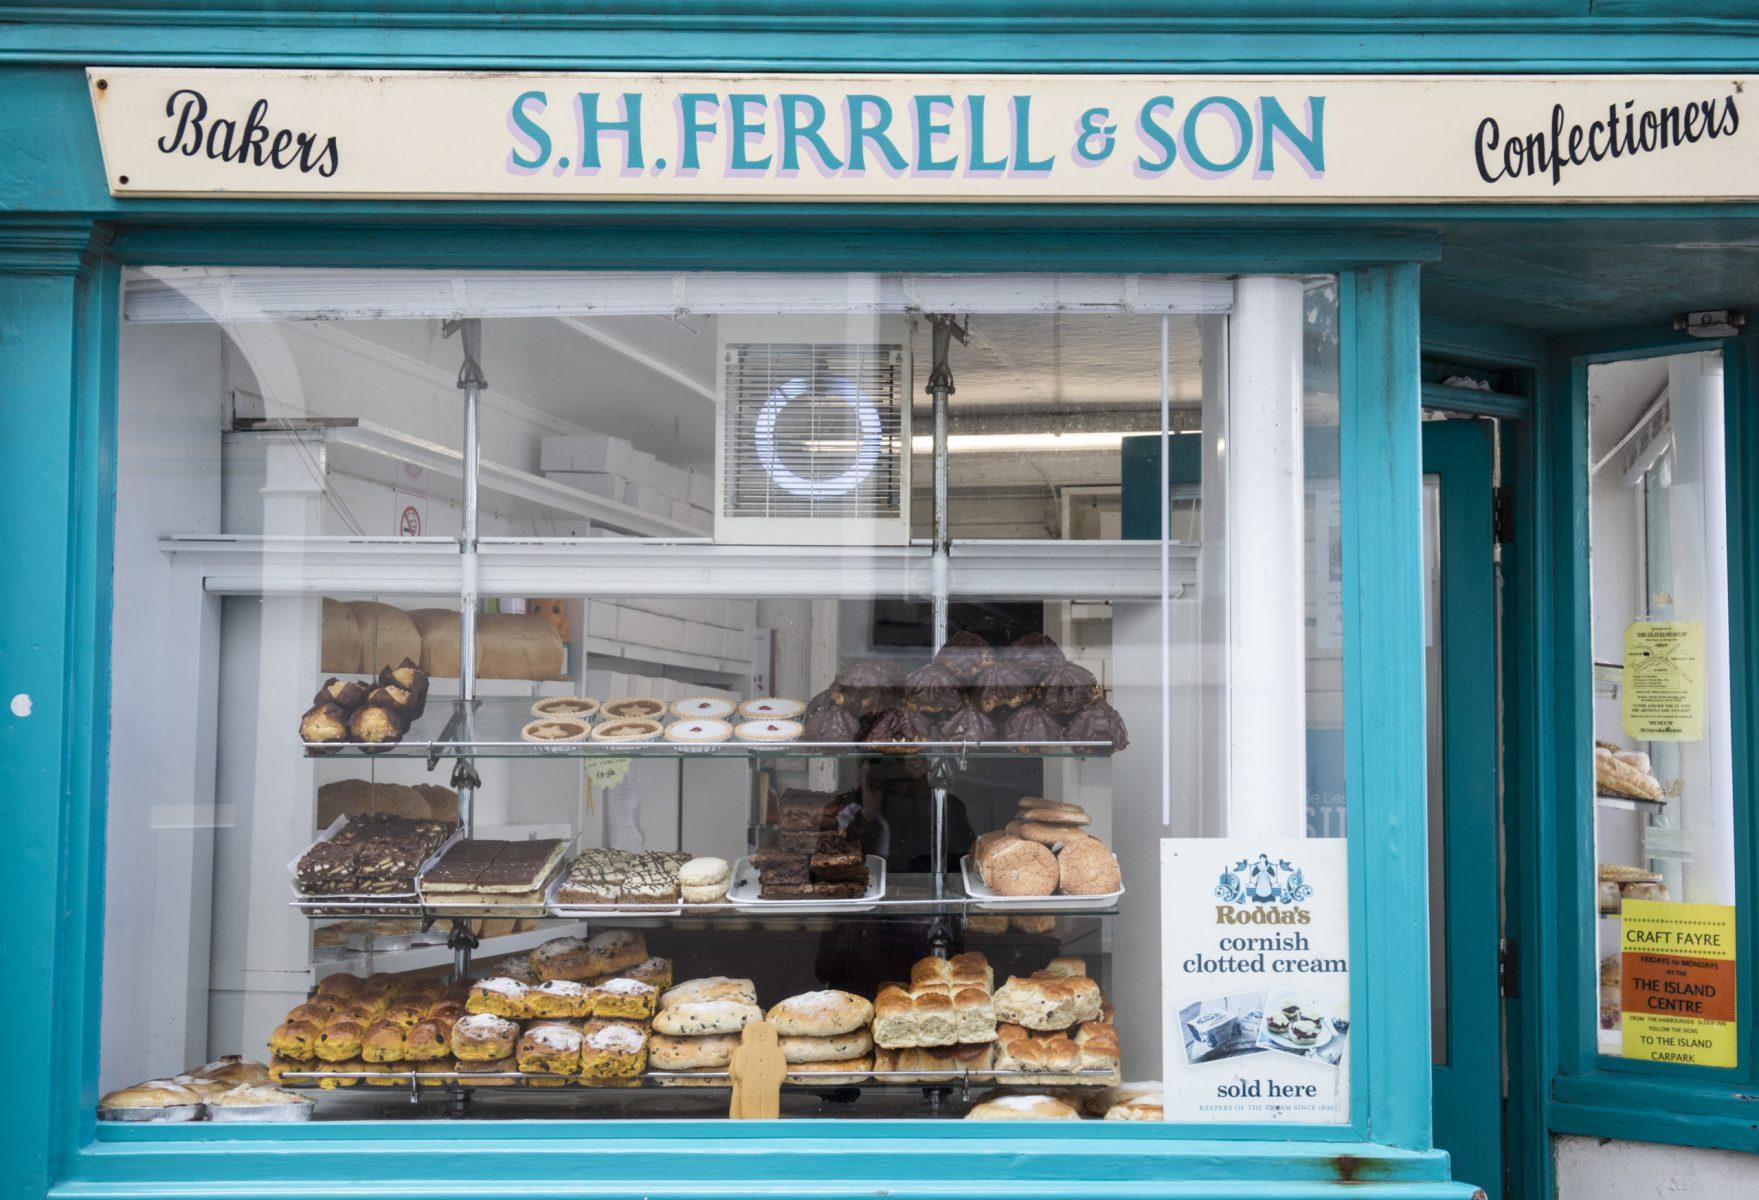 S.H.Ferrell & Son Bakery, St Ives, Cornwall